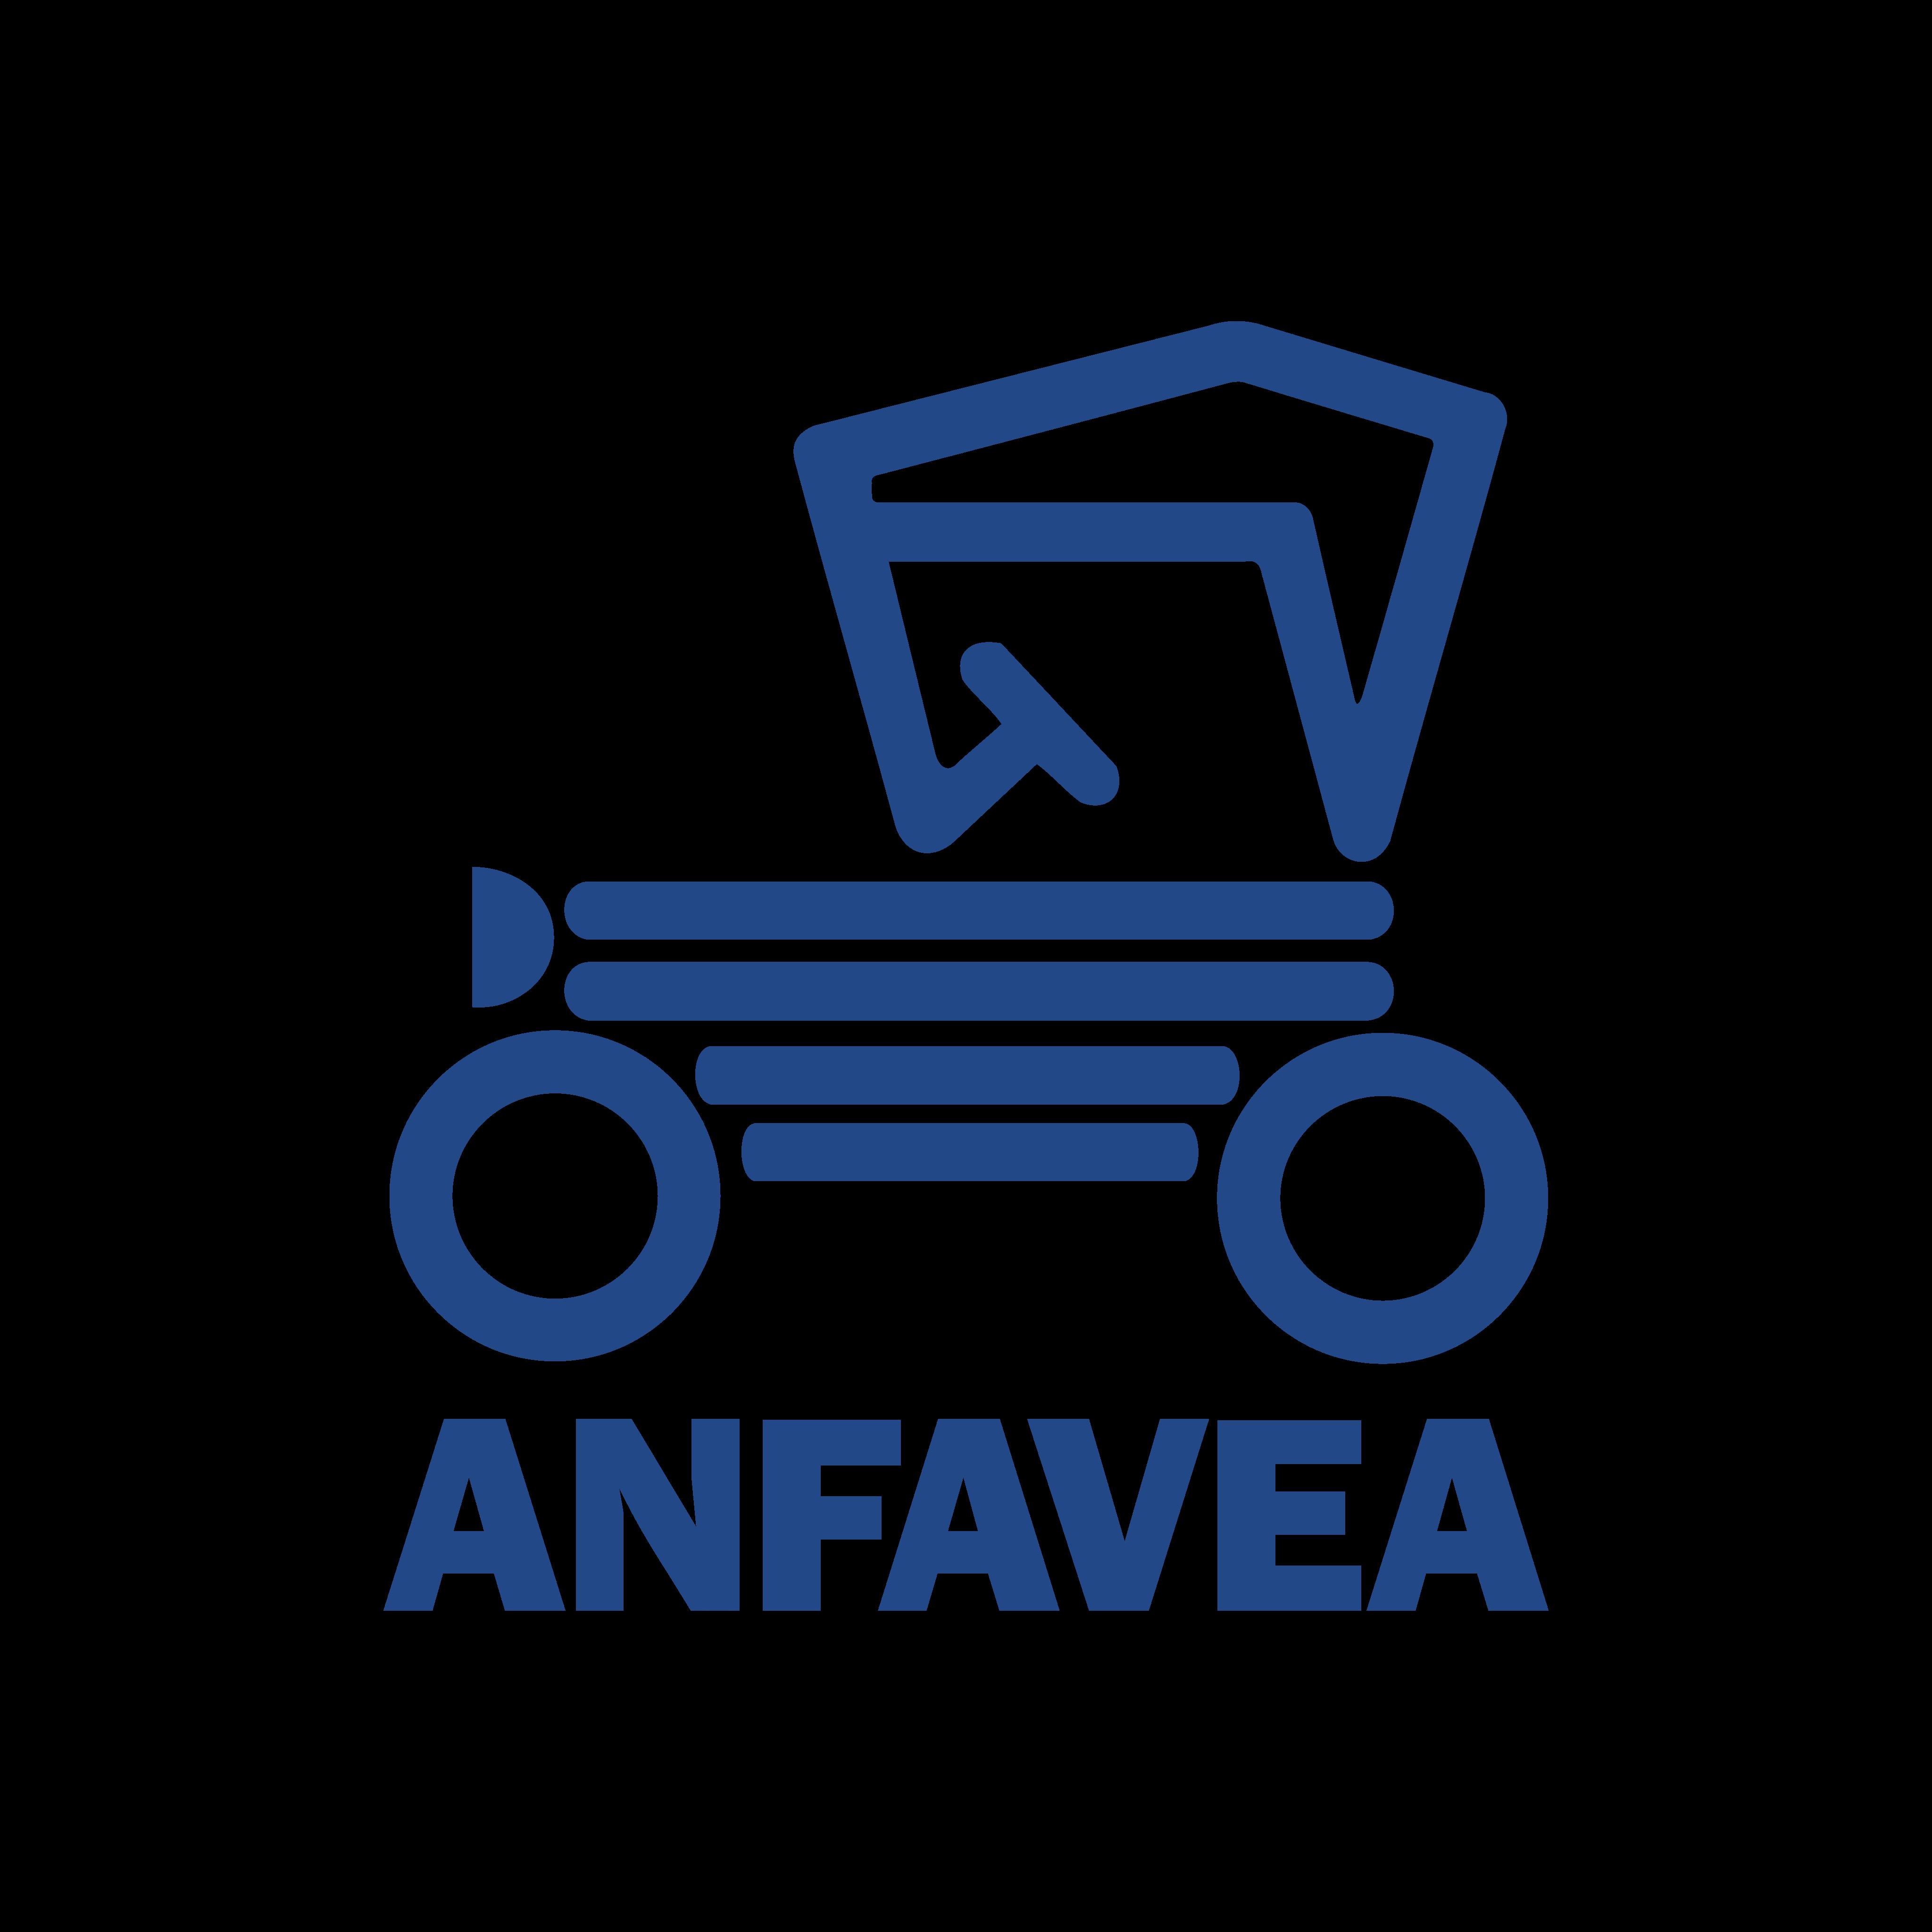 anfavea logo 0 - ANFAVEA Logo